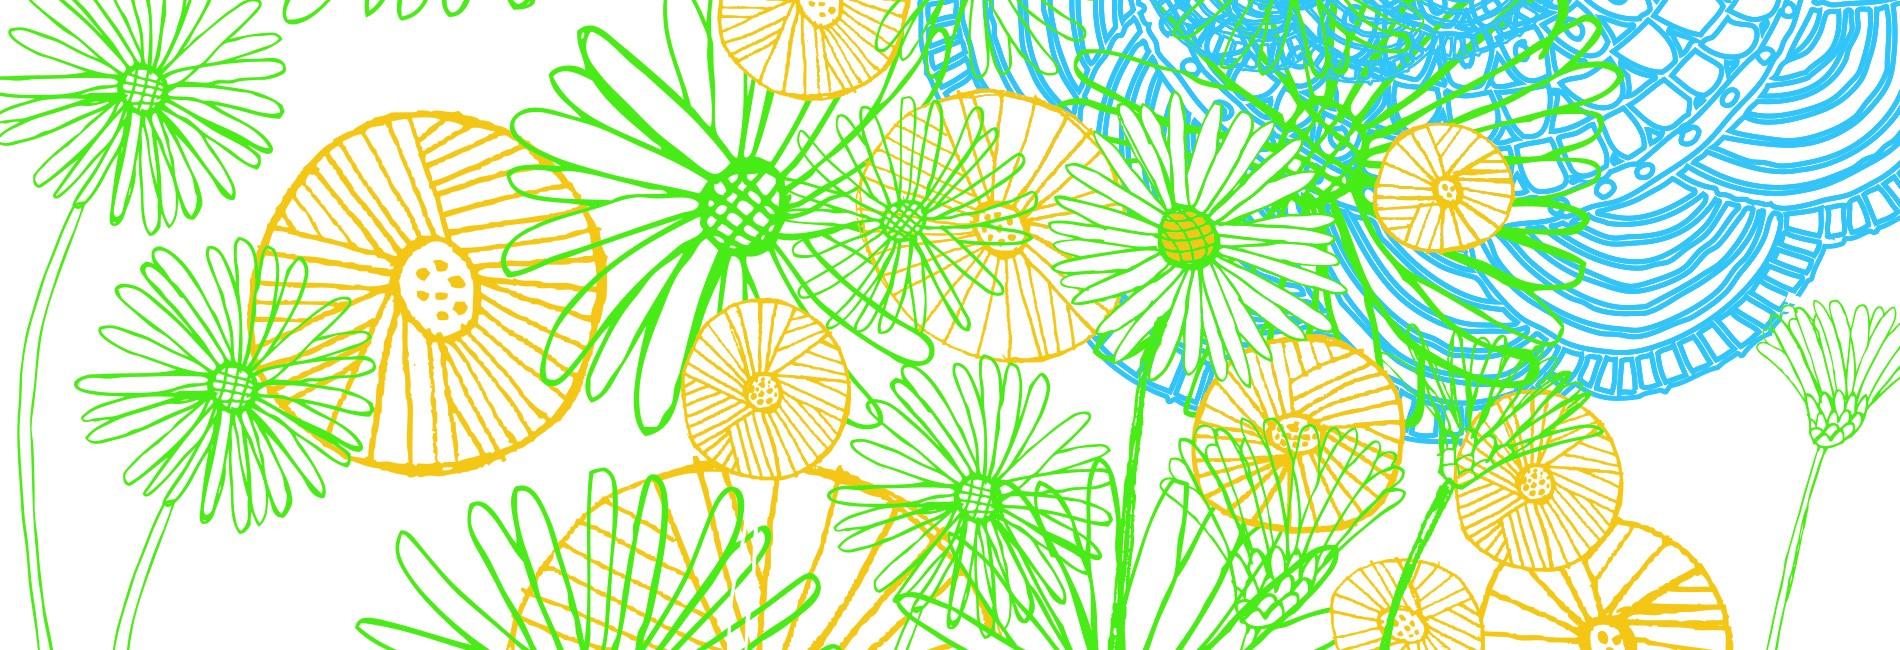 fleurs en illustration